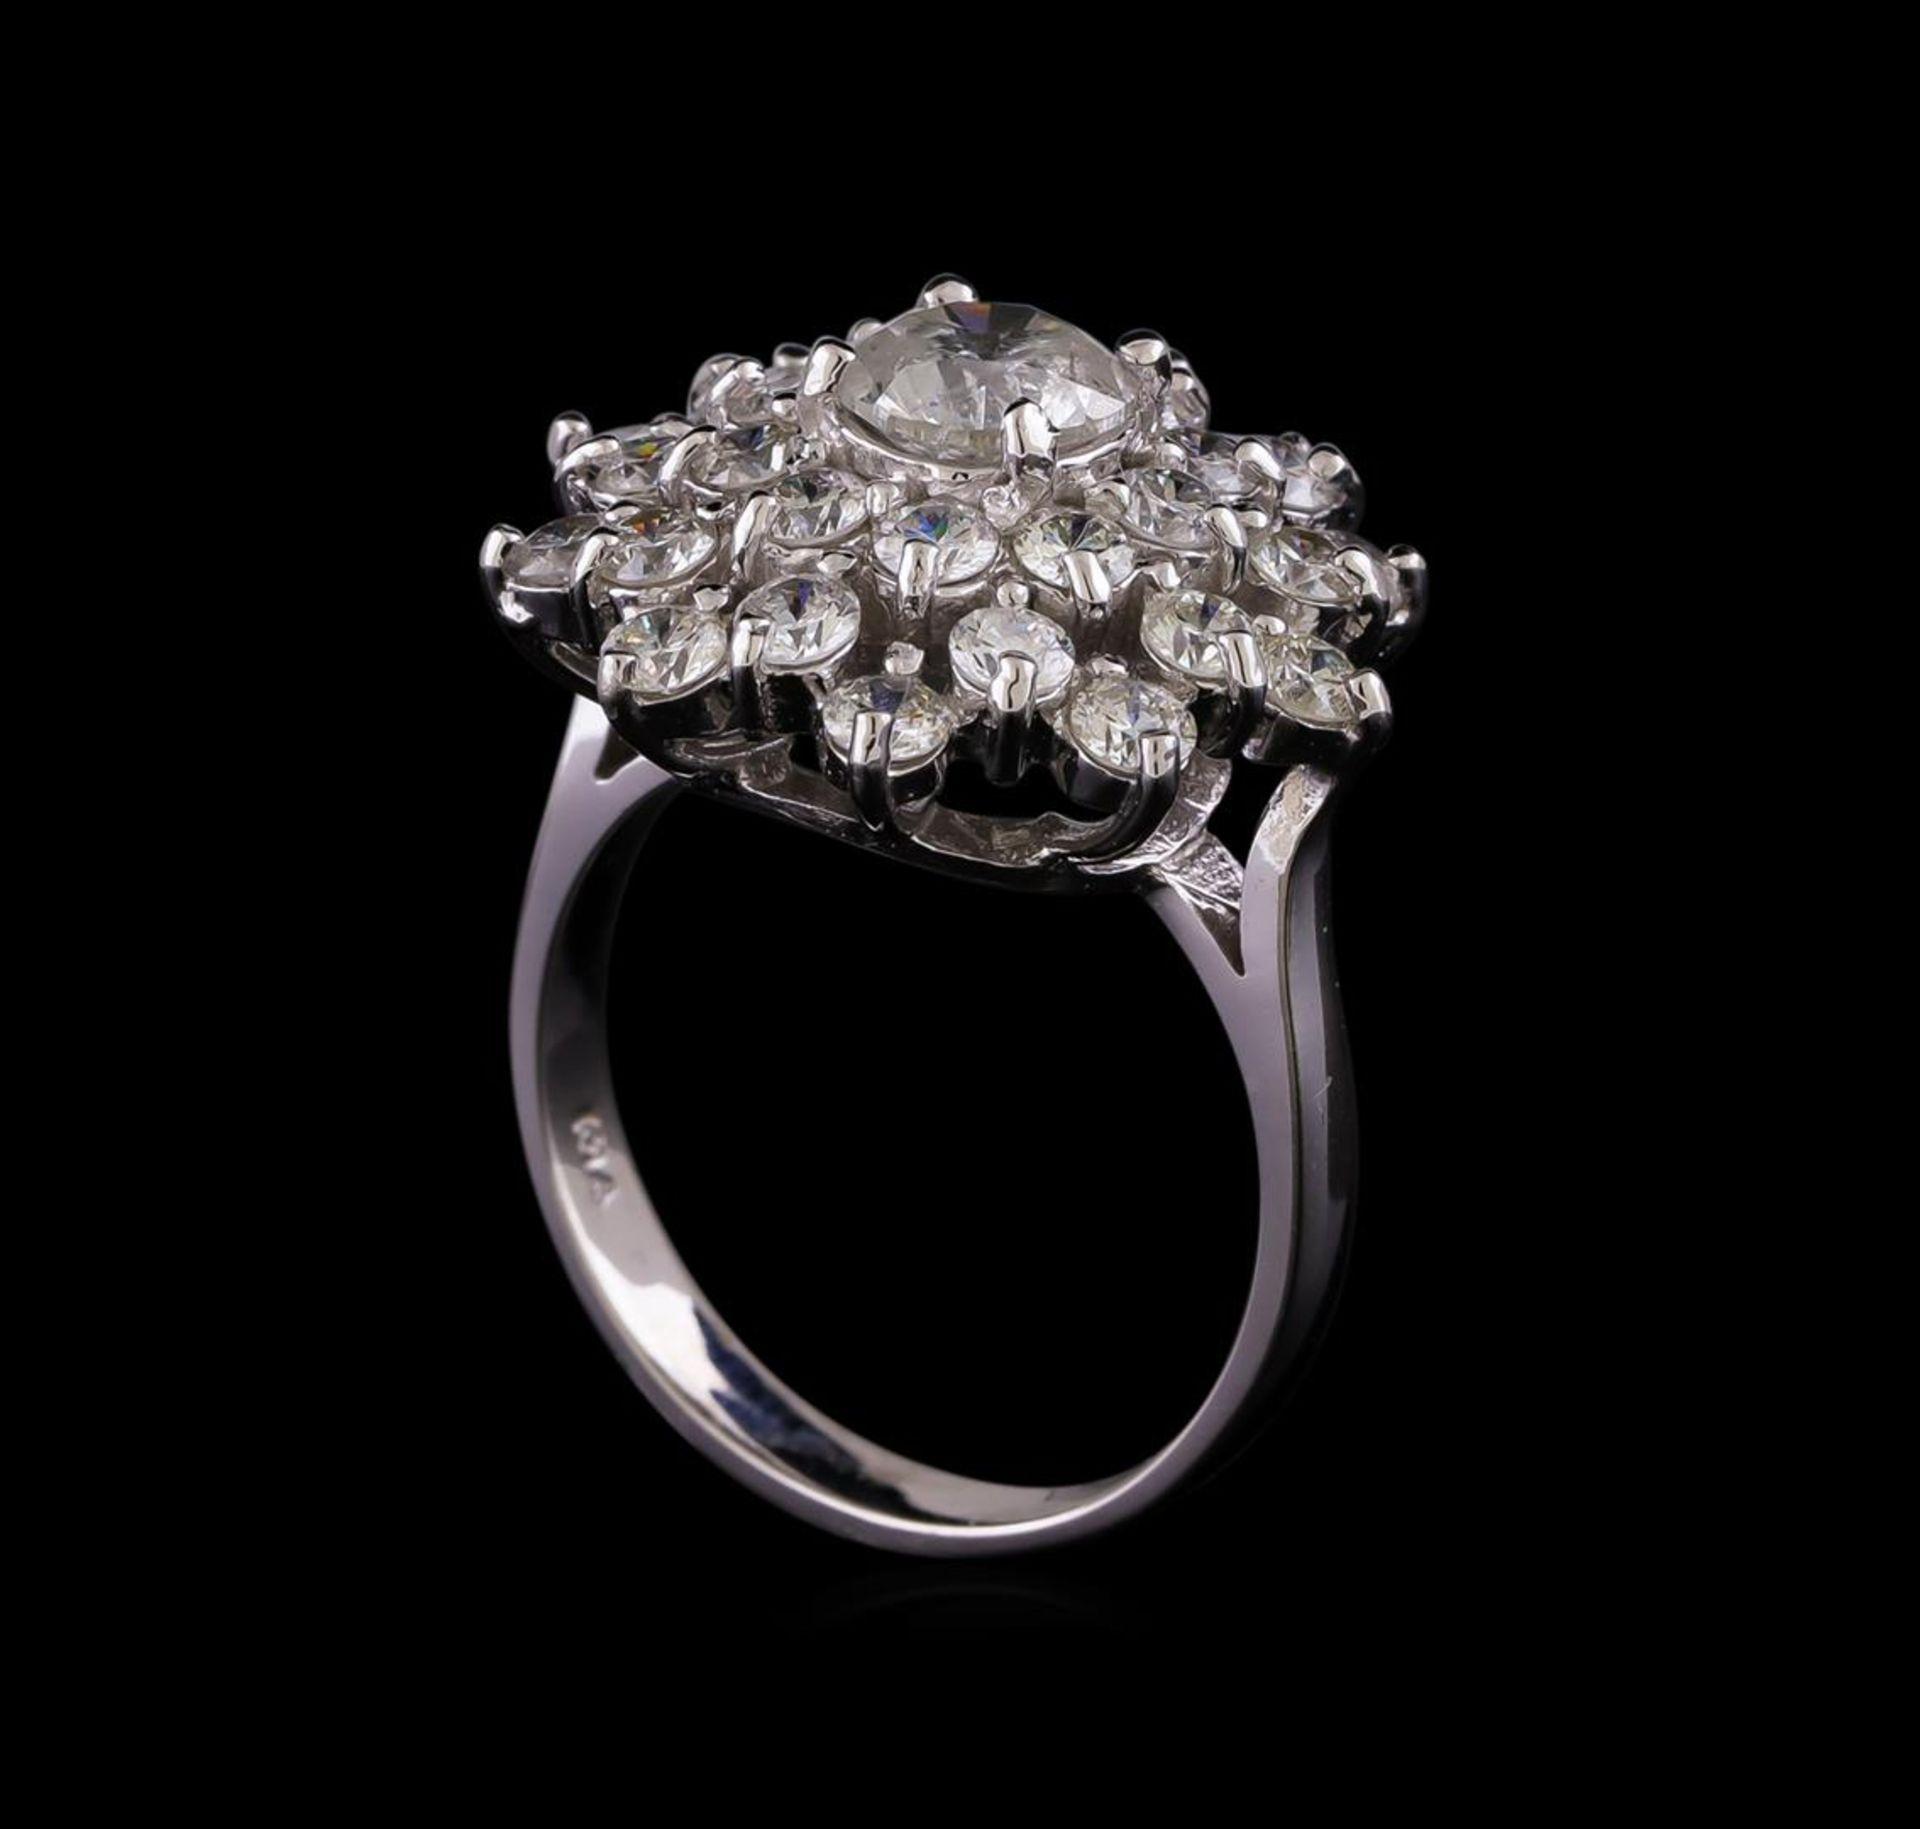 14KT White Gold 2.64 ctw Diamond Ring - Image 4 of 5